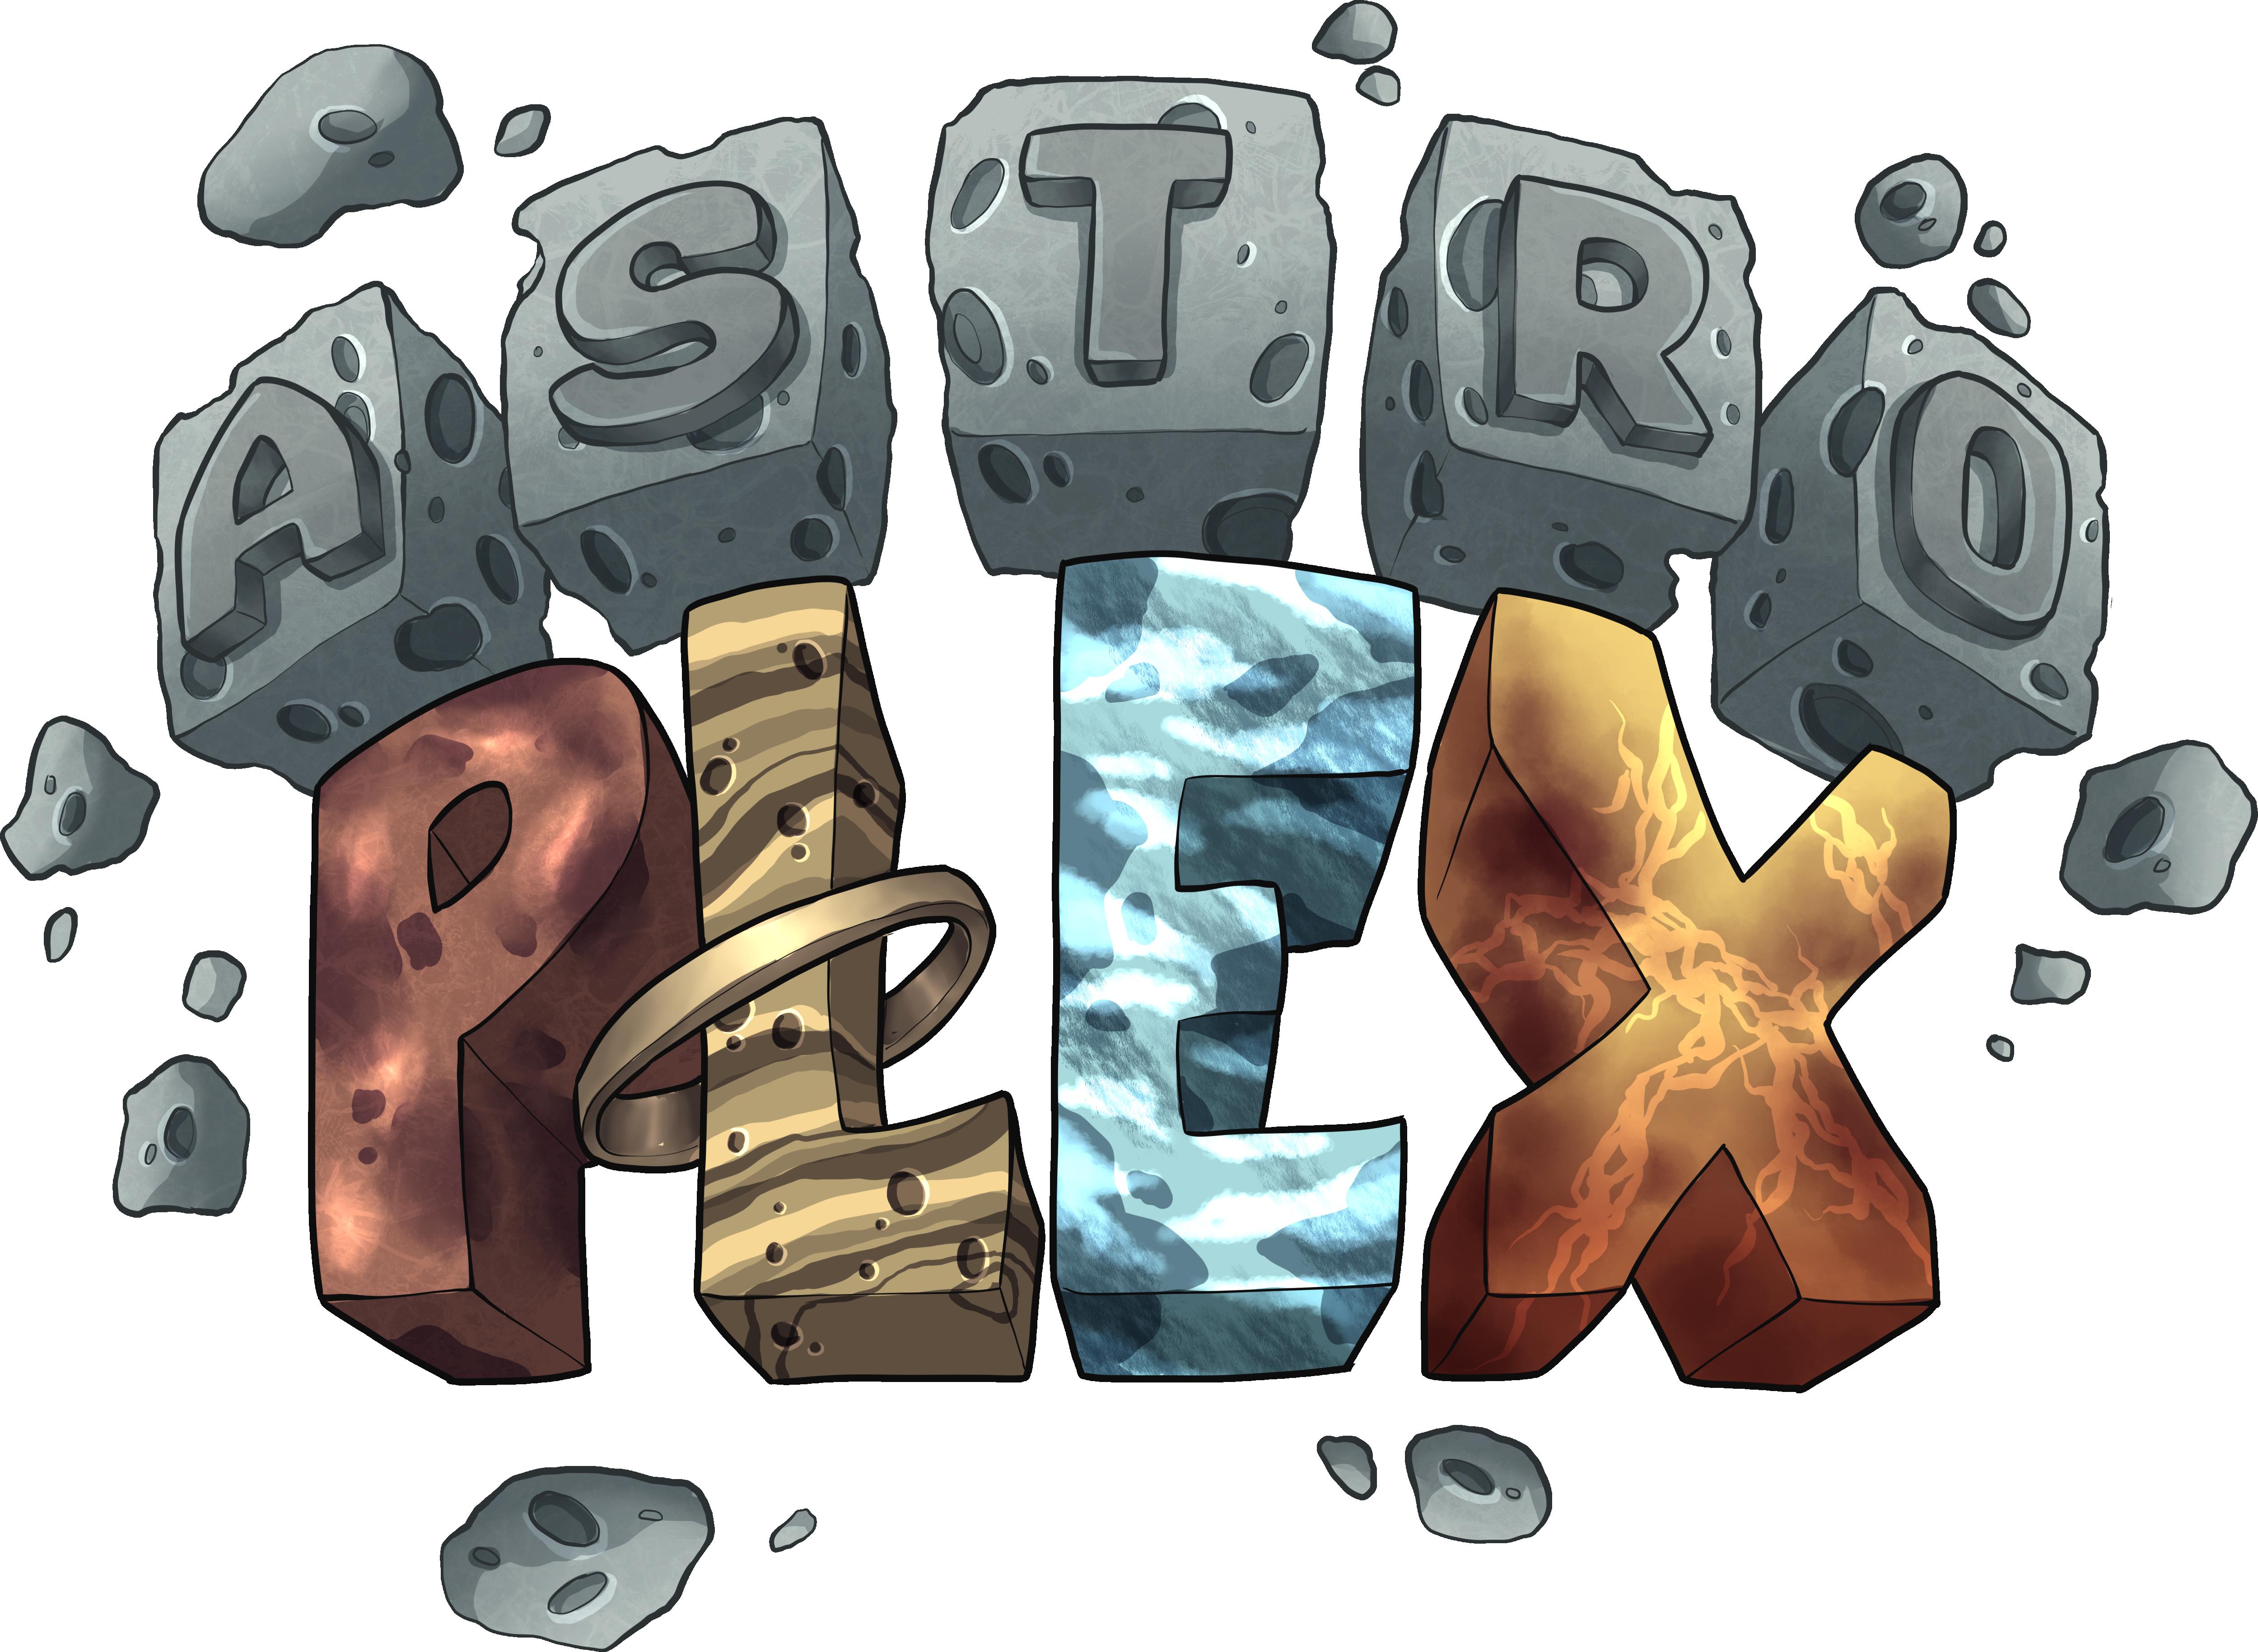 AstroPlex